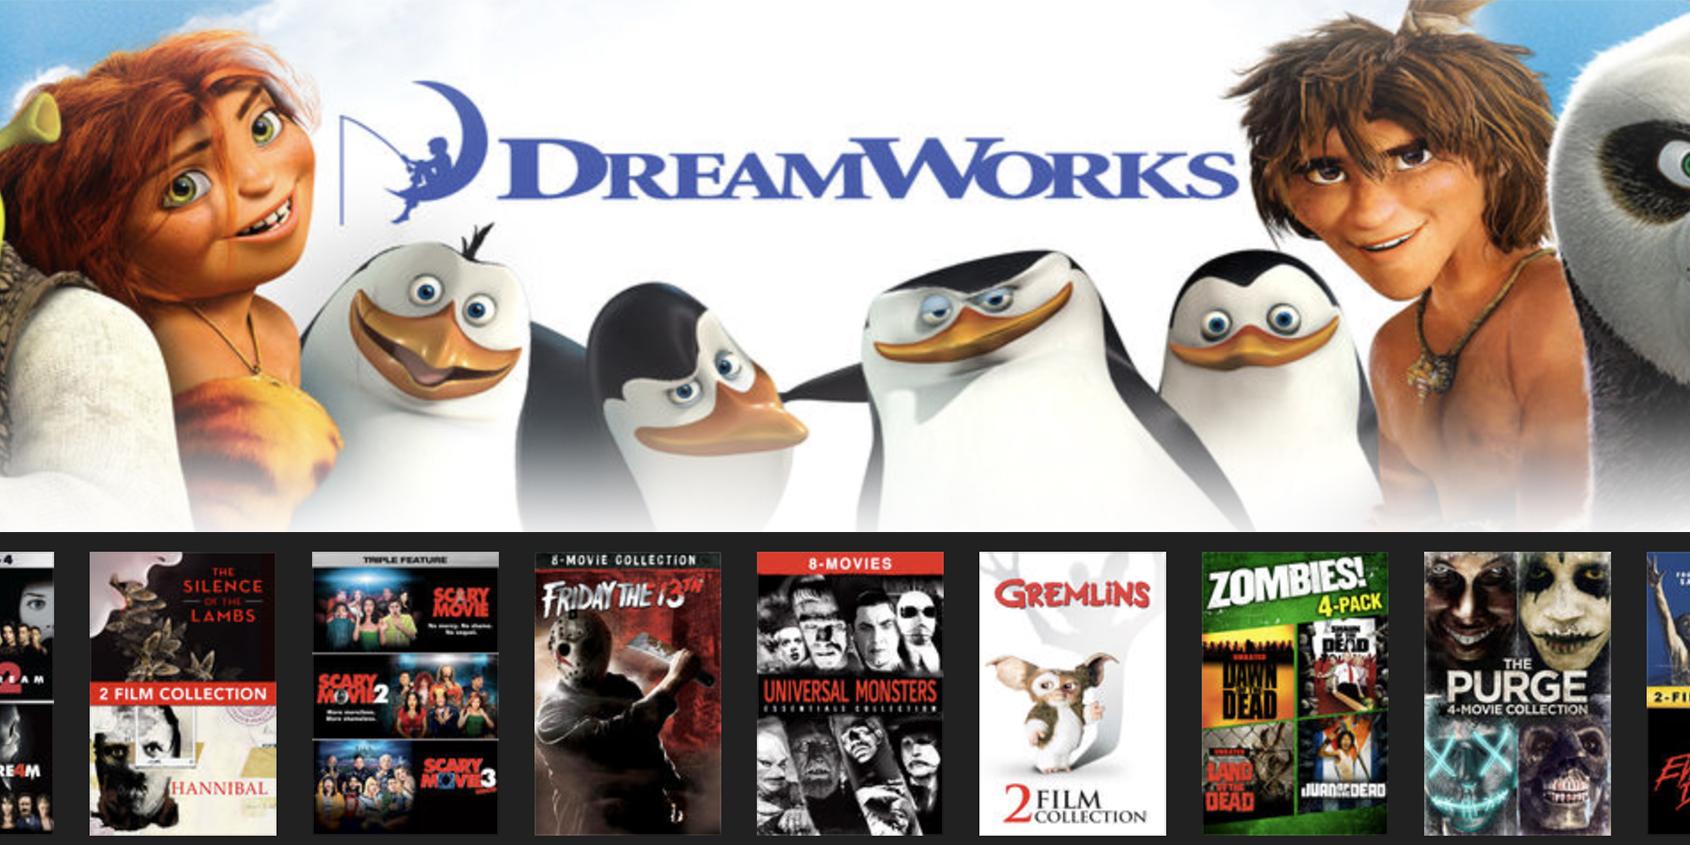 iTunes kicks off movie bundle sale from $10 plus DreamWorks